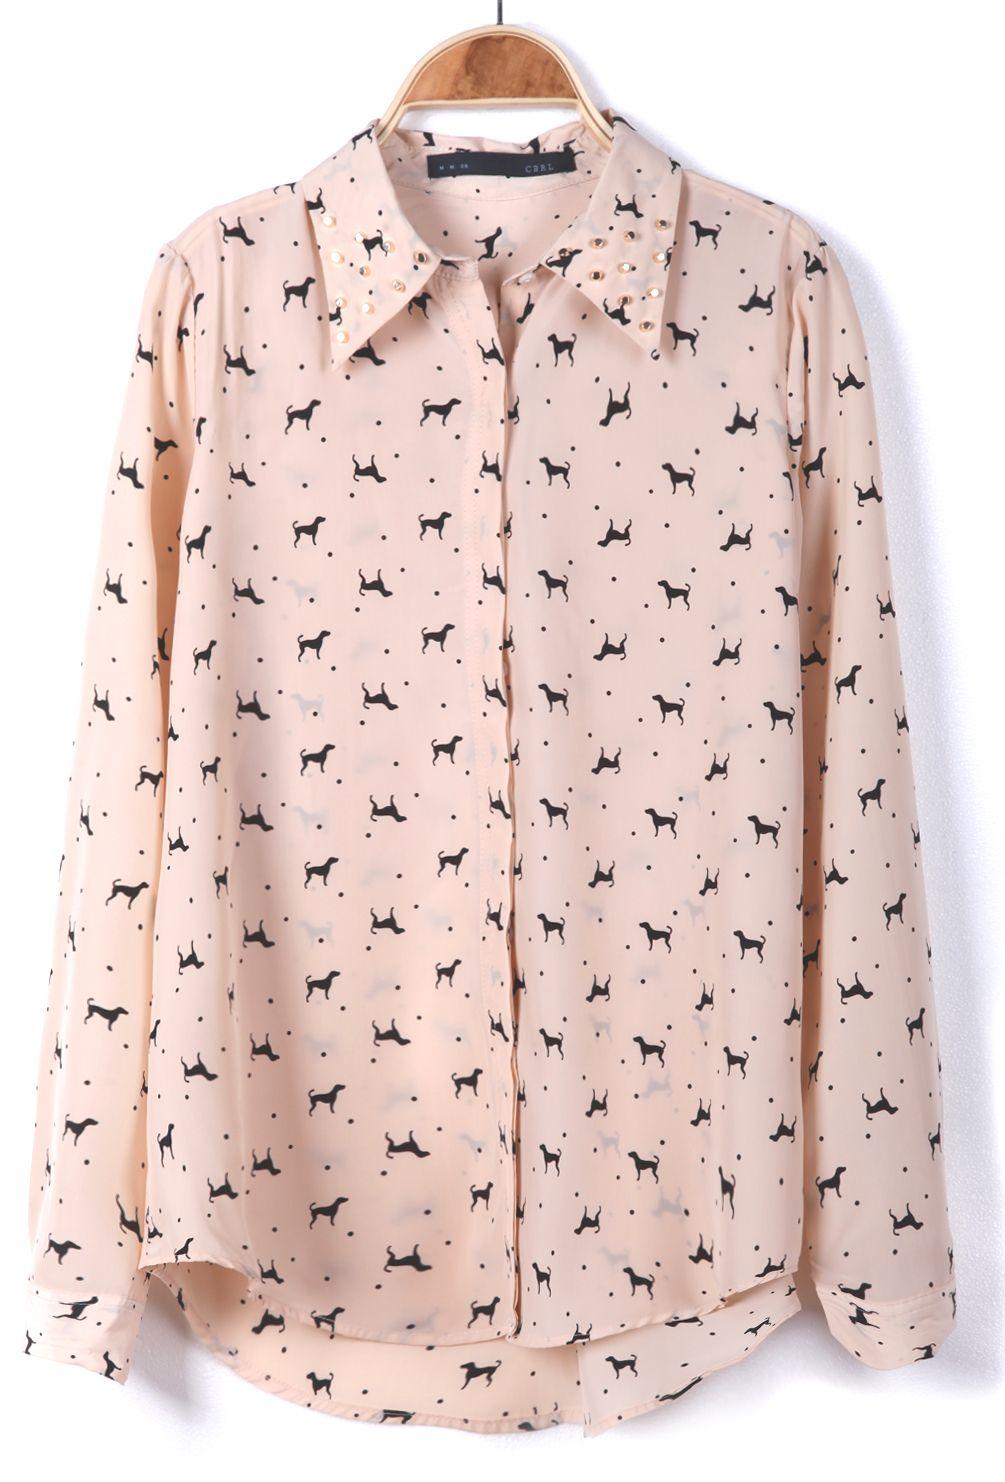 little dogs print chiffon blouse super cute print put it on